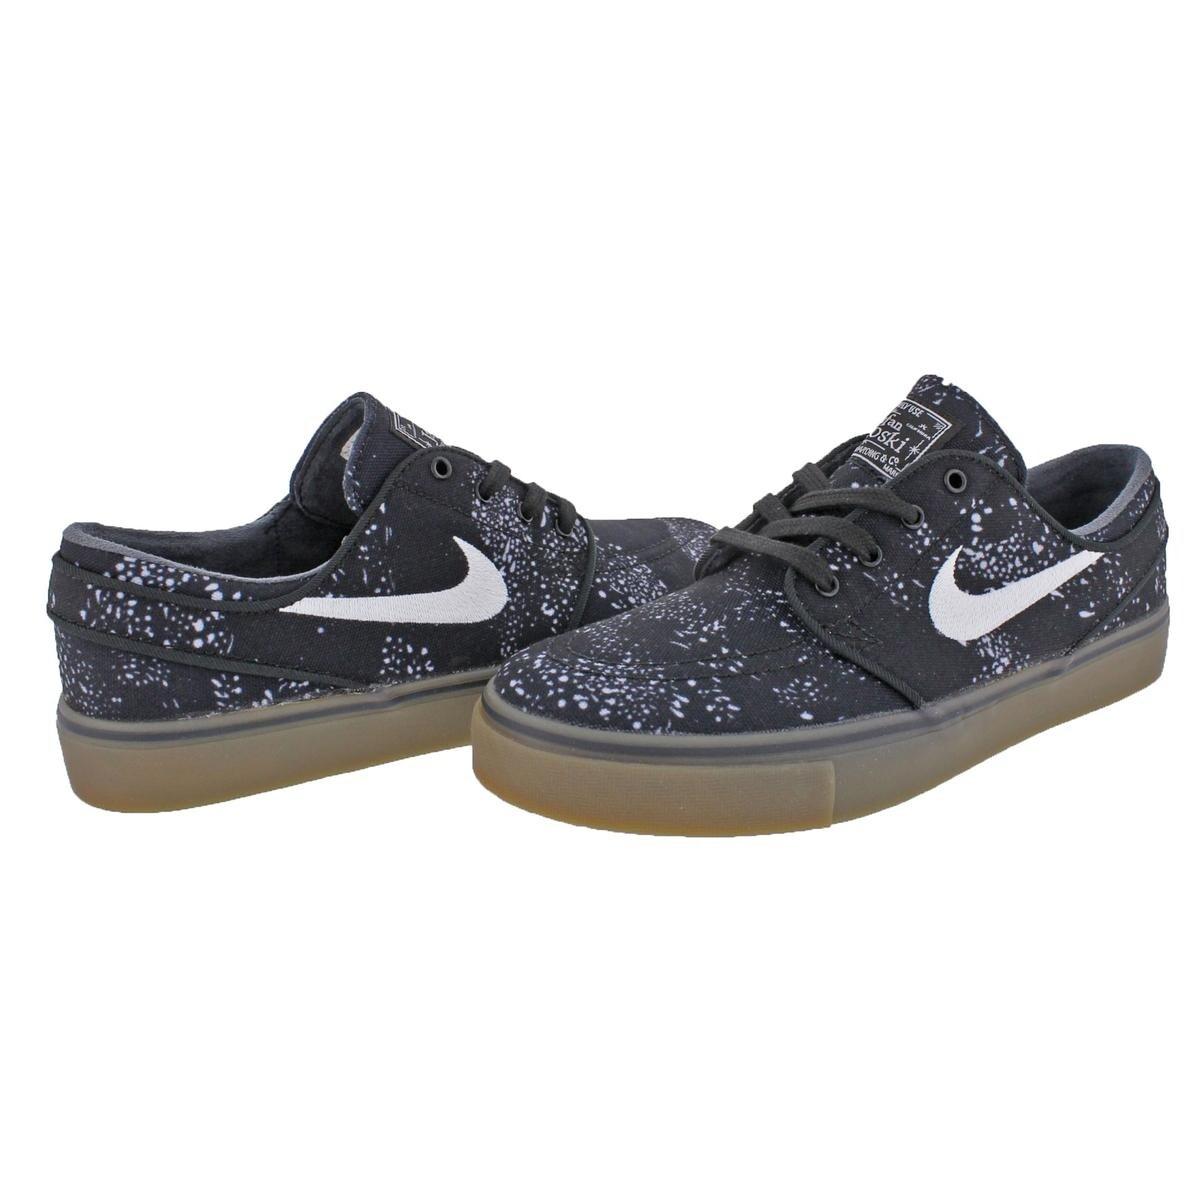 290d977528df8 Nike Mens SB Stefan Janoski Canvas PRM Skateboarding Shoes Canvas Printed